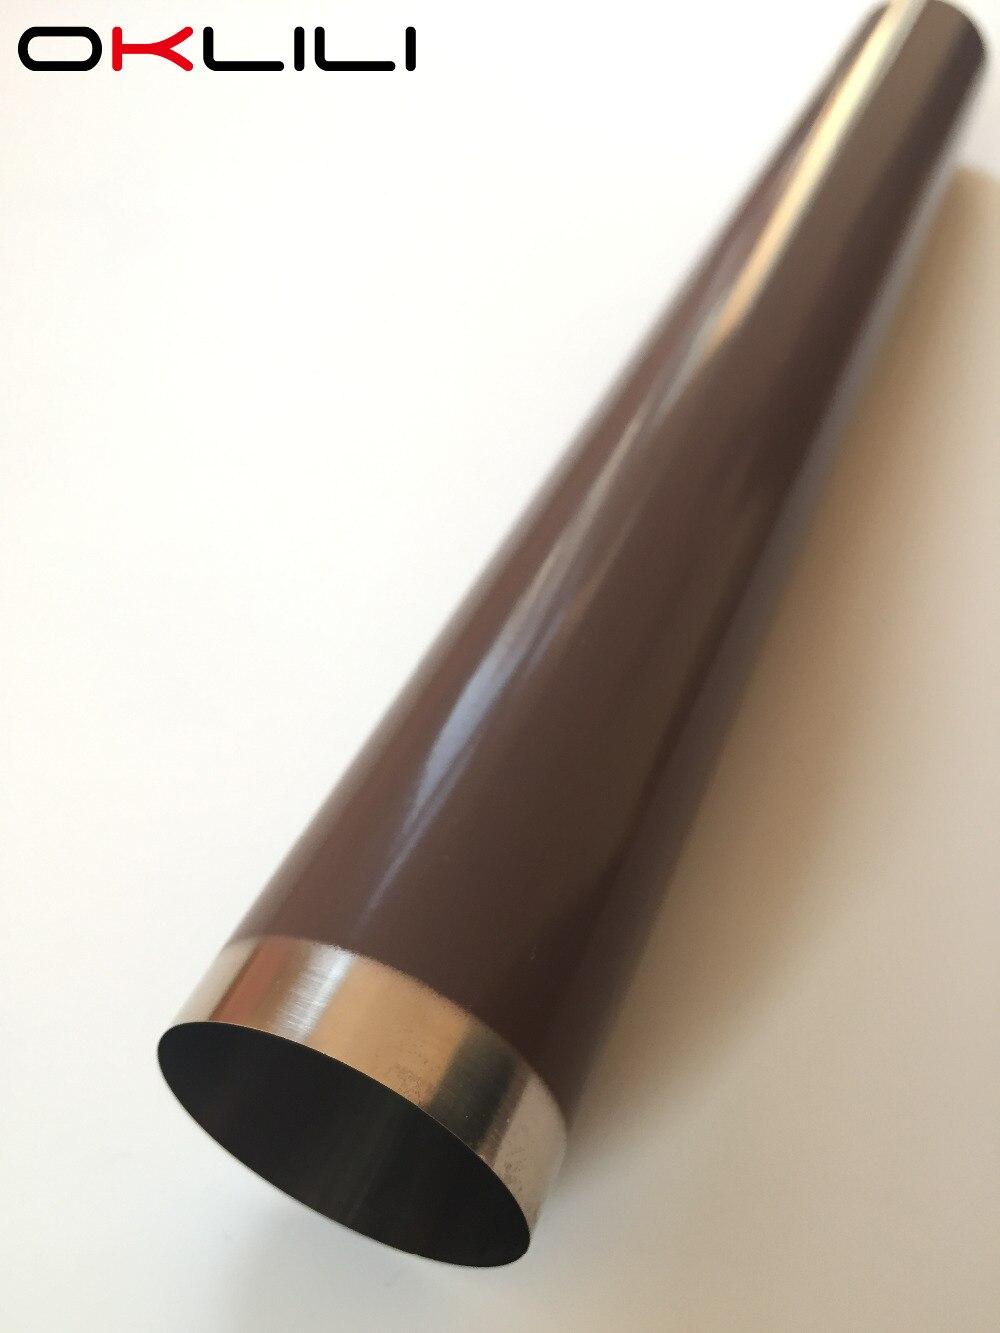 1 Fuser Film Sleeve for HP LaserJet 4250 4350 RL1-0024  Grade A free Grease